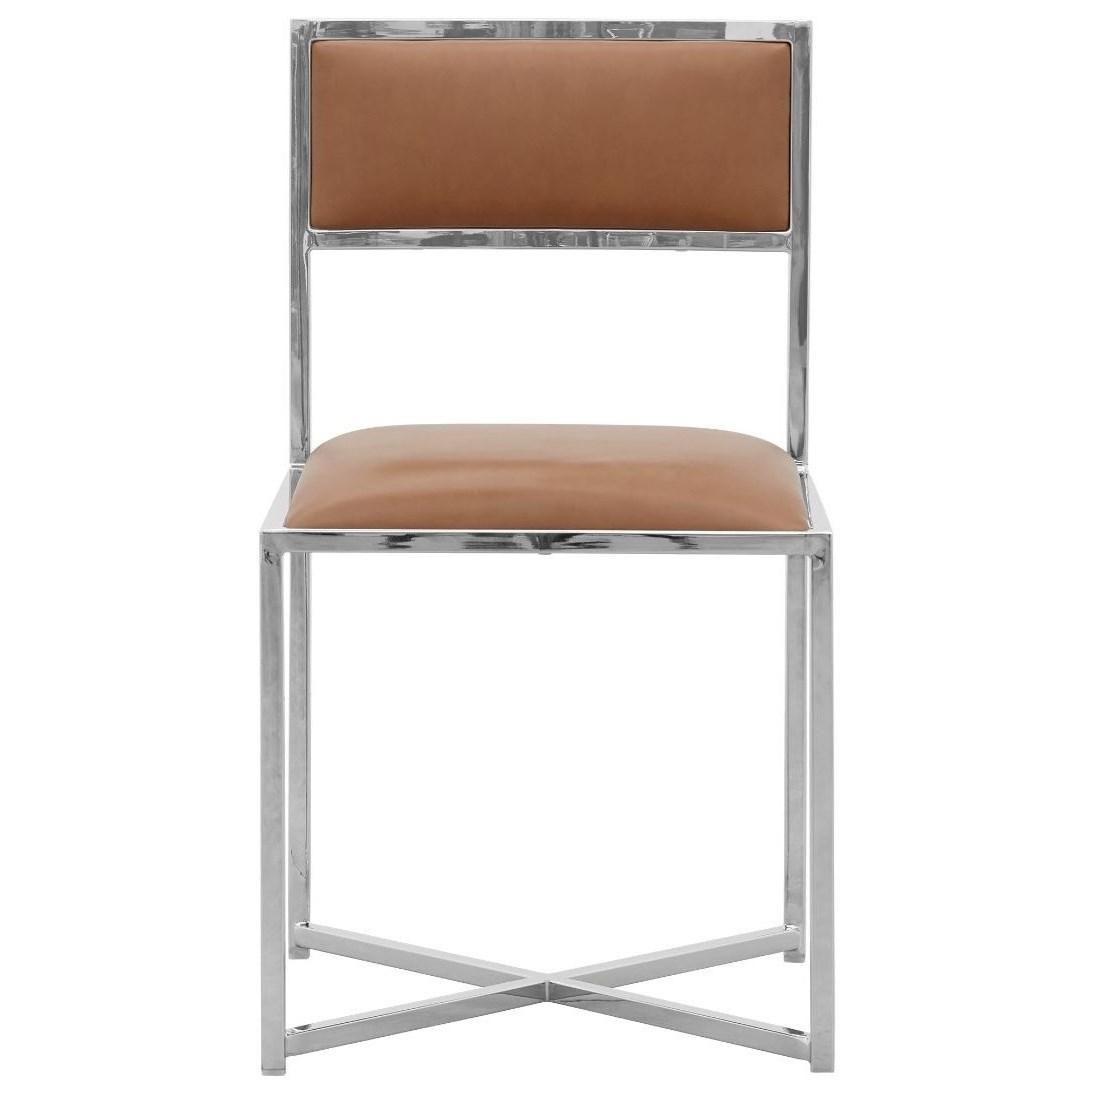 X-Base Chair in Cognac